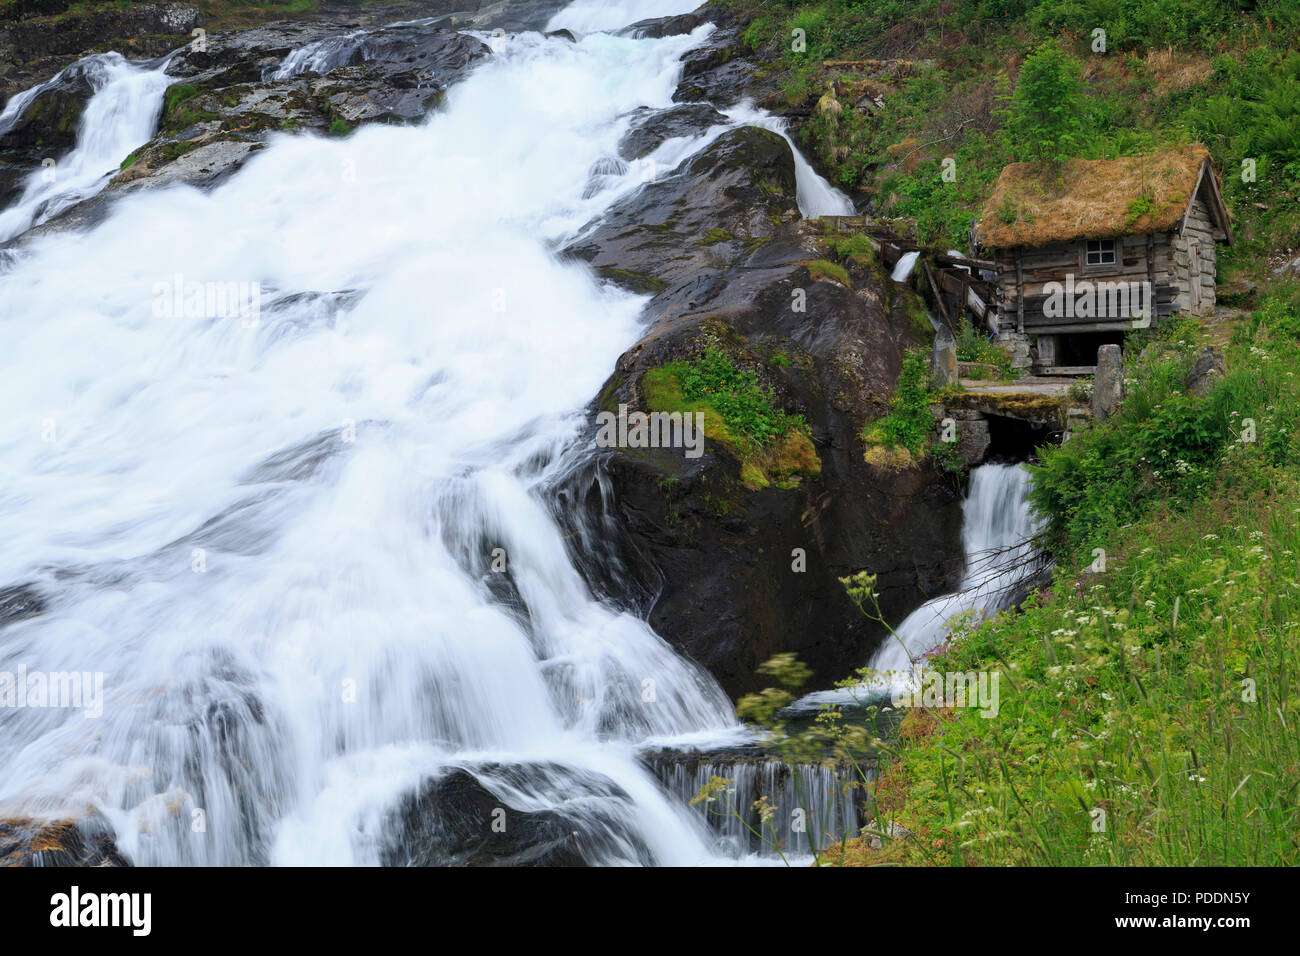 Hellyltfossen Waterfall, Hellesylt Village, More og Romsdal County, Norway - Stock Image